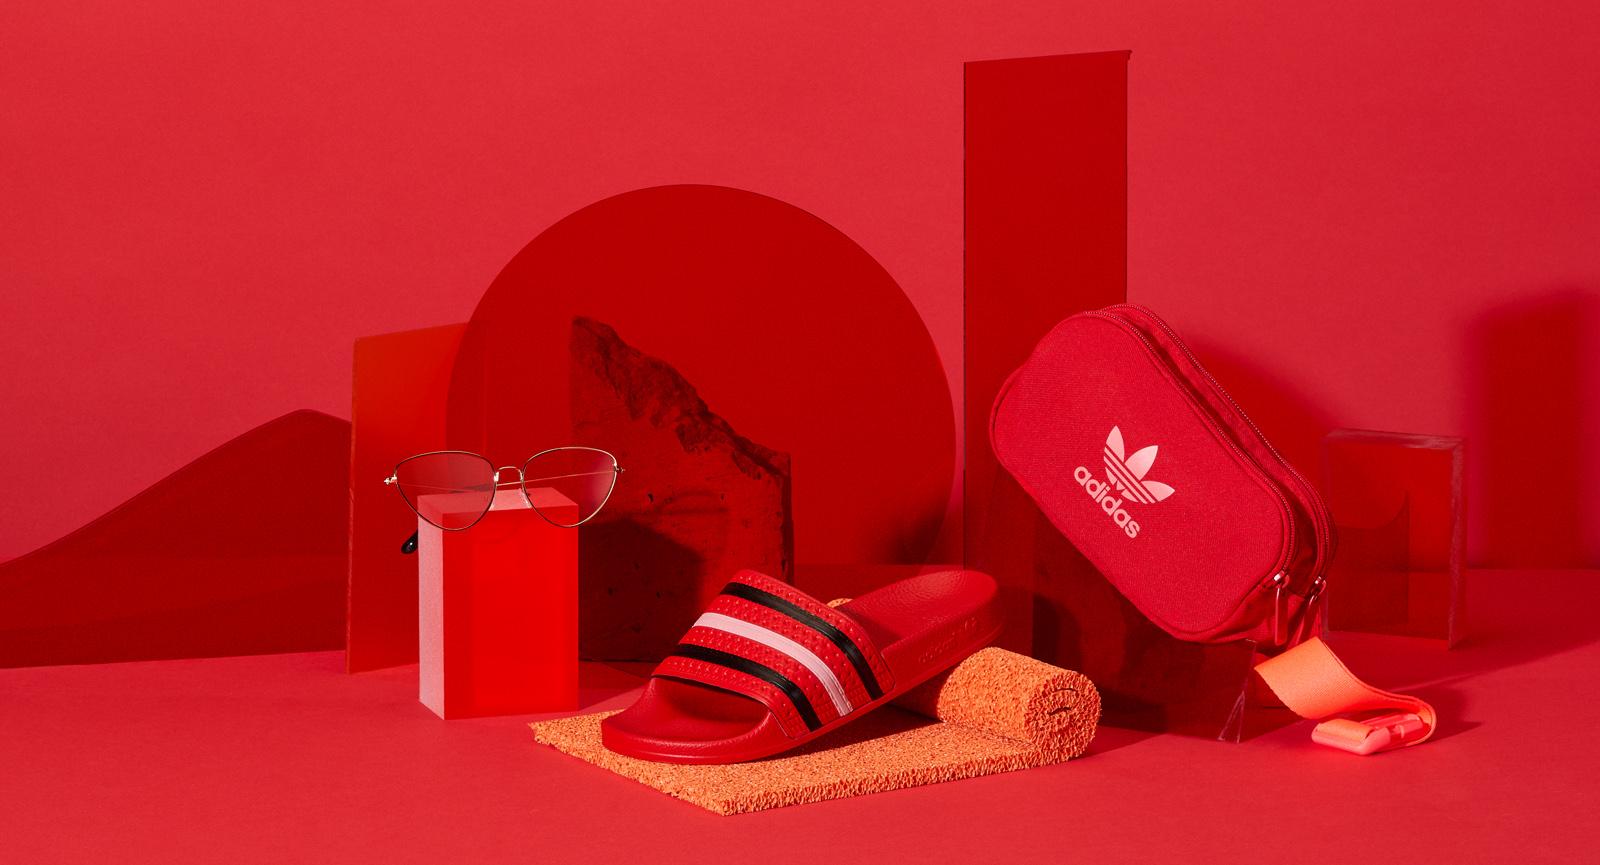 Zalando Sale Campaign Image with summer accessories